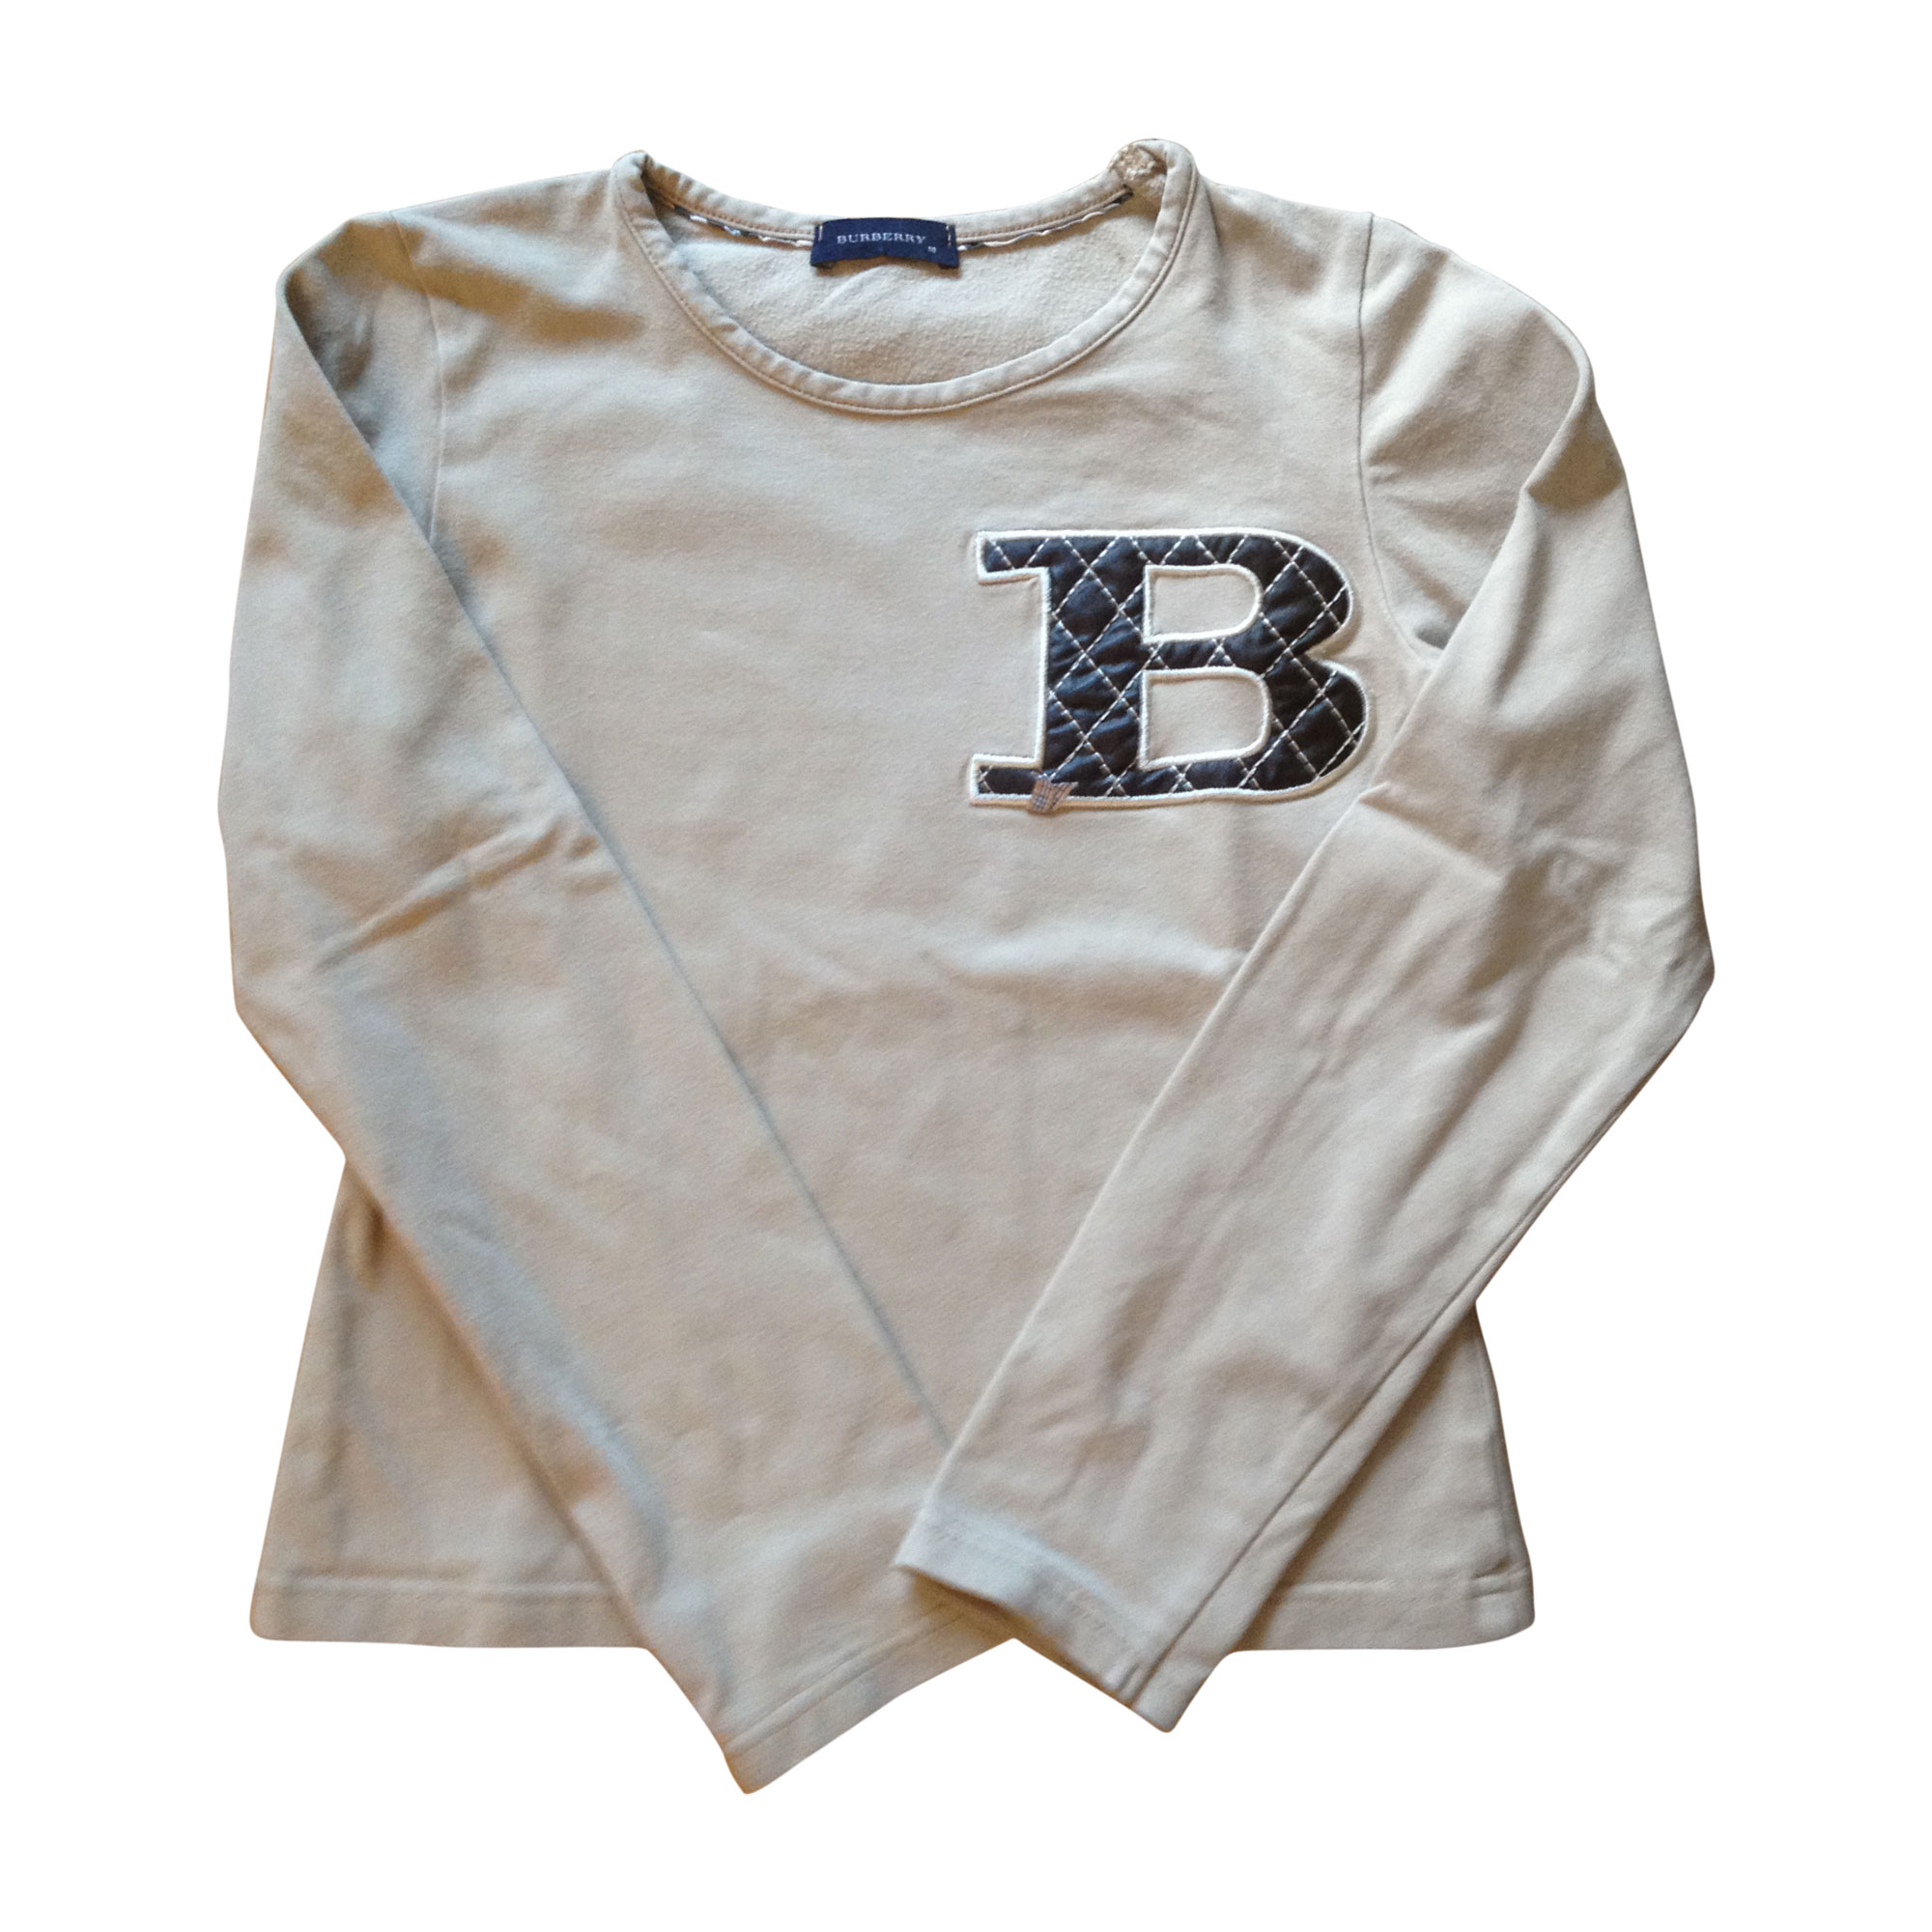 Top, Tee-shirt BURBERRY Beige, camel